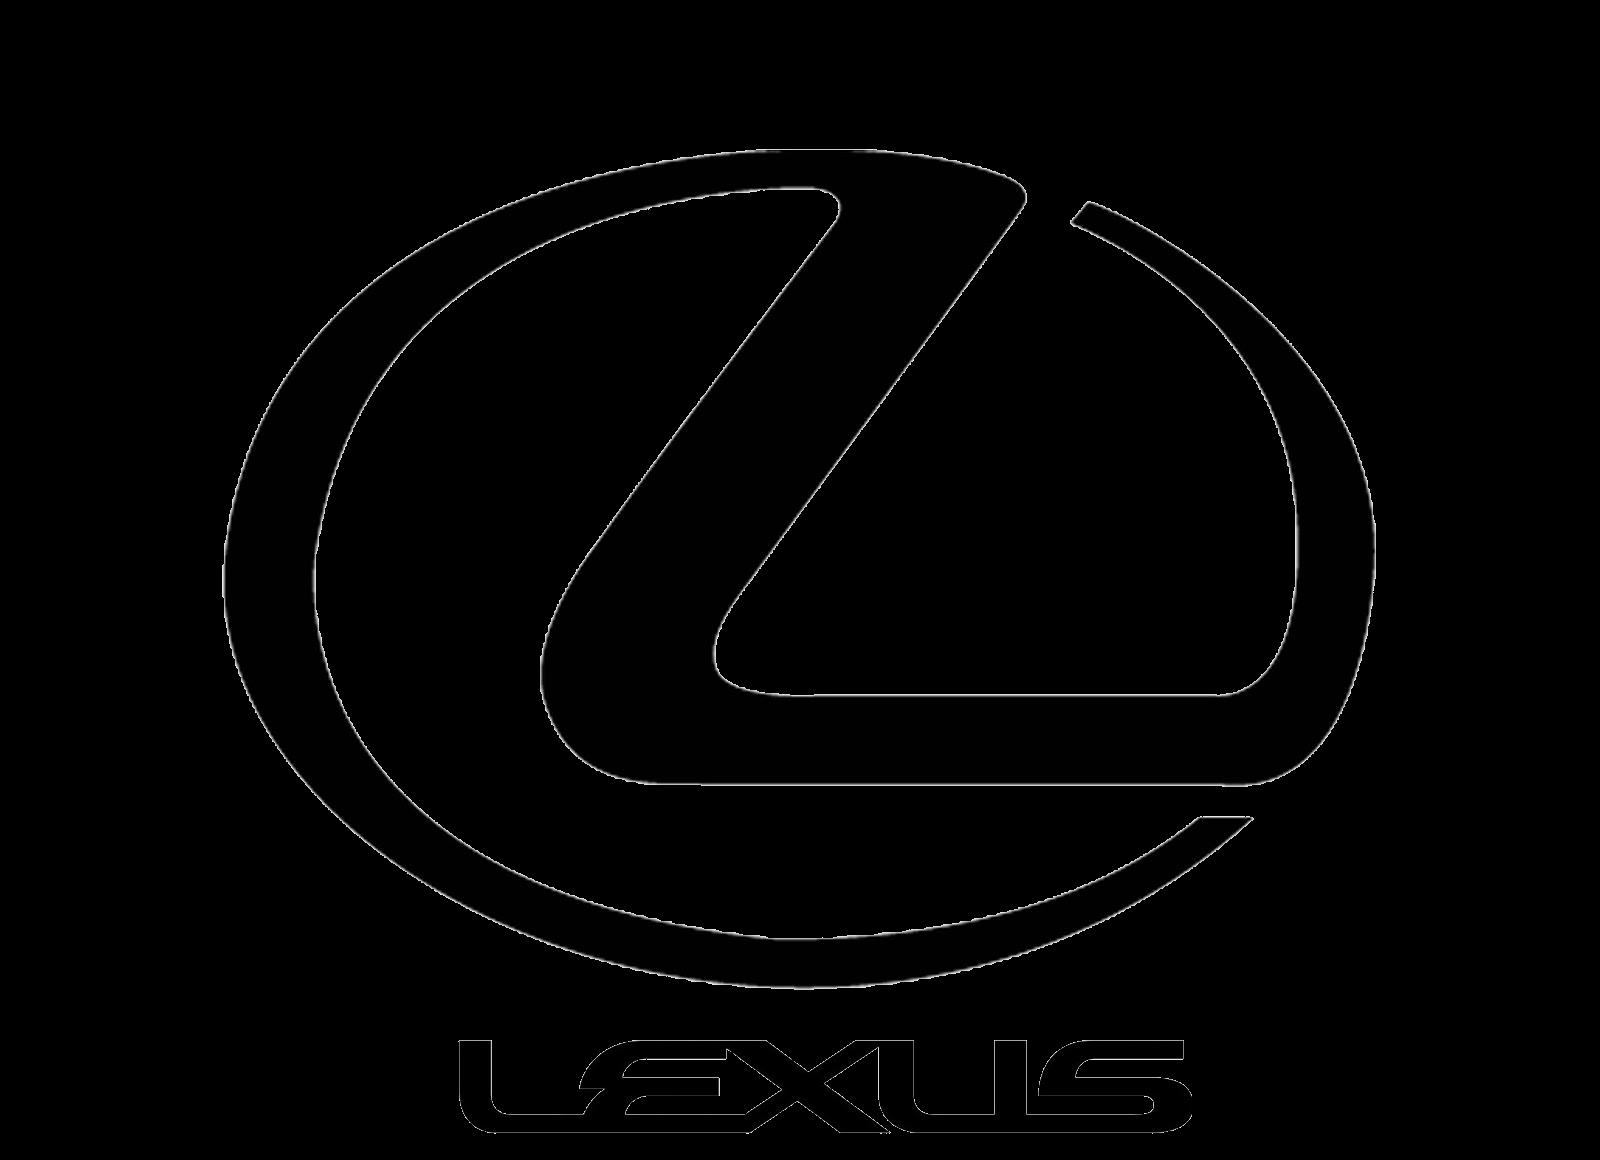 Lexus Car Logo - Lexus Auto L